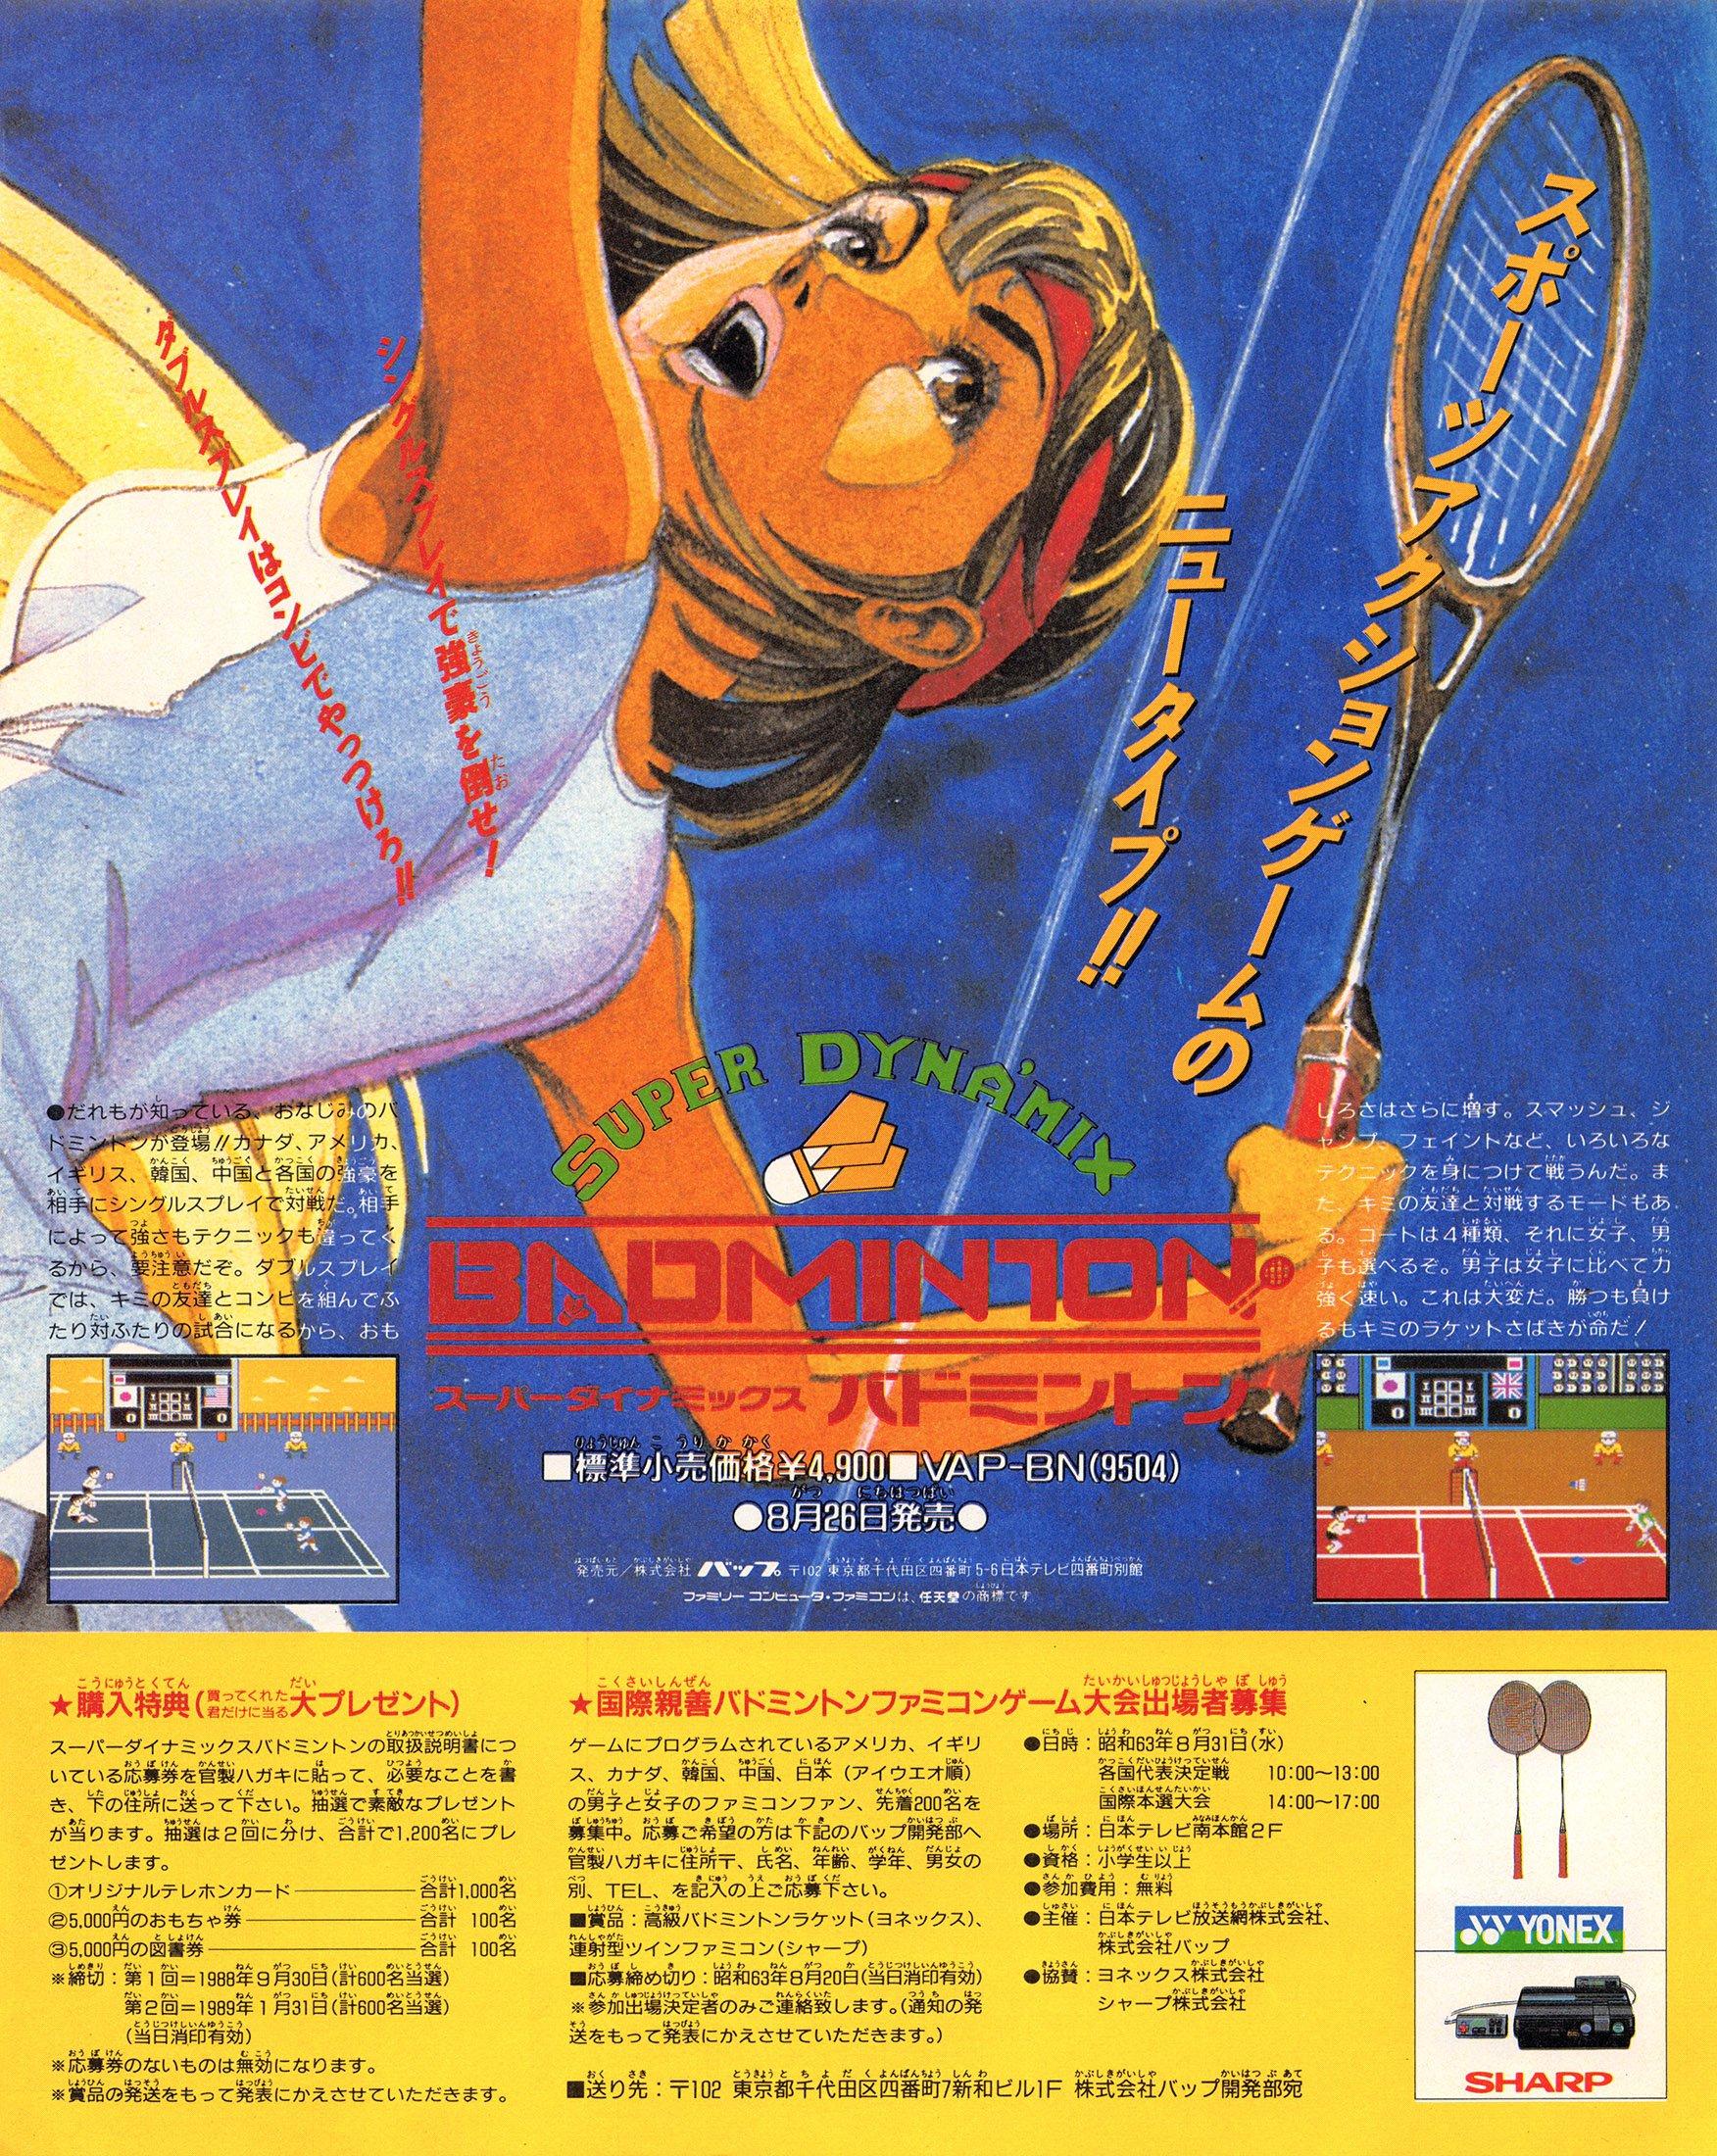 Super Dyna'mix Badminton (Japan)